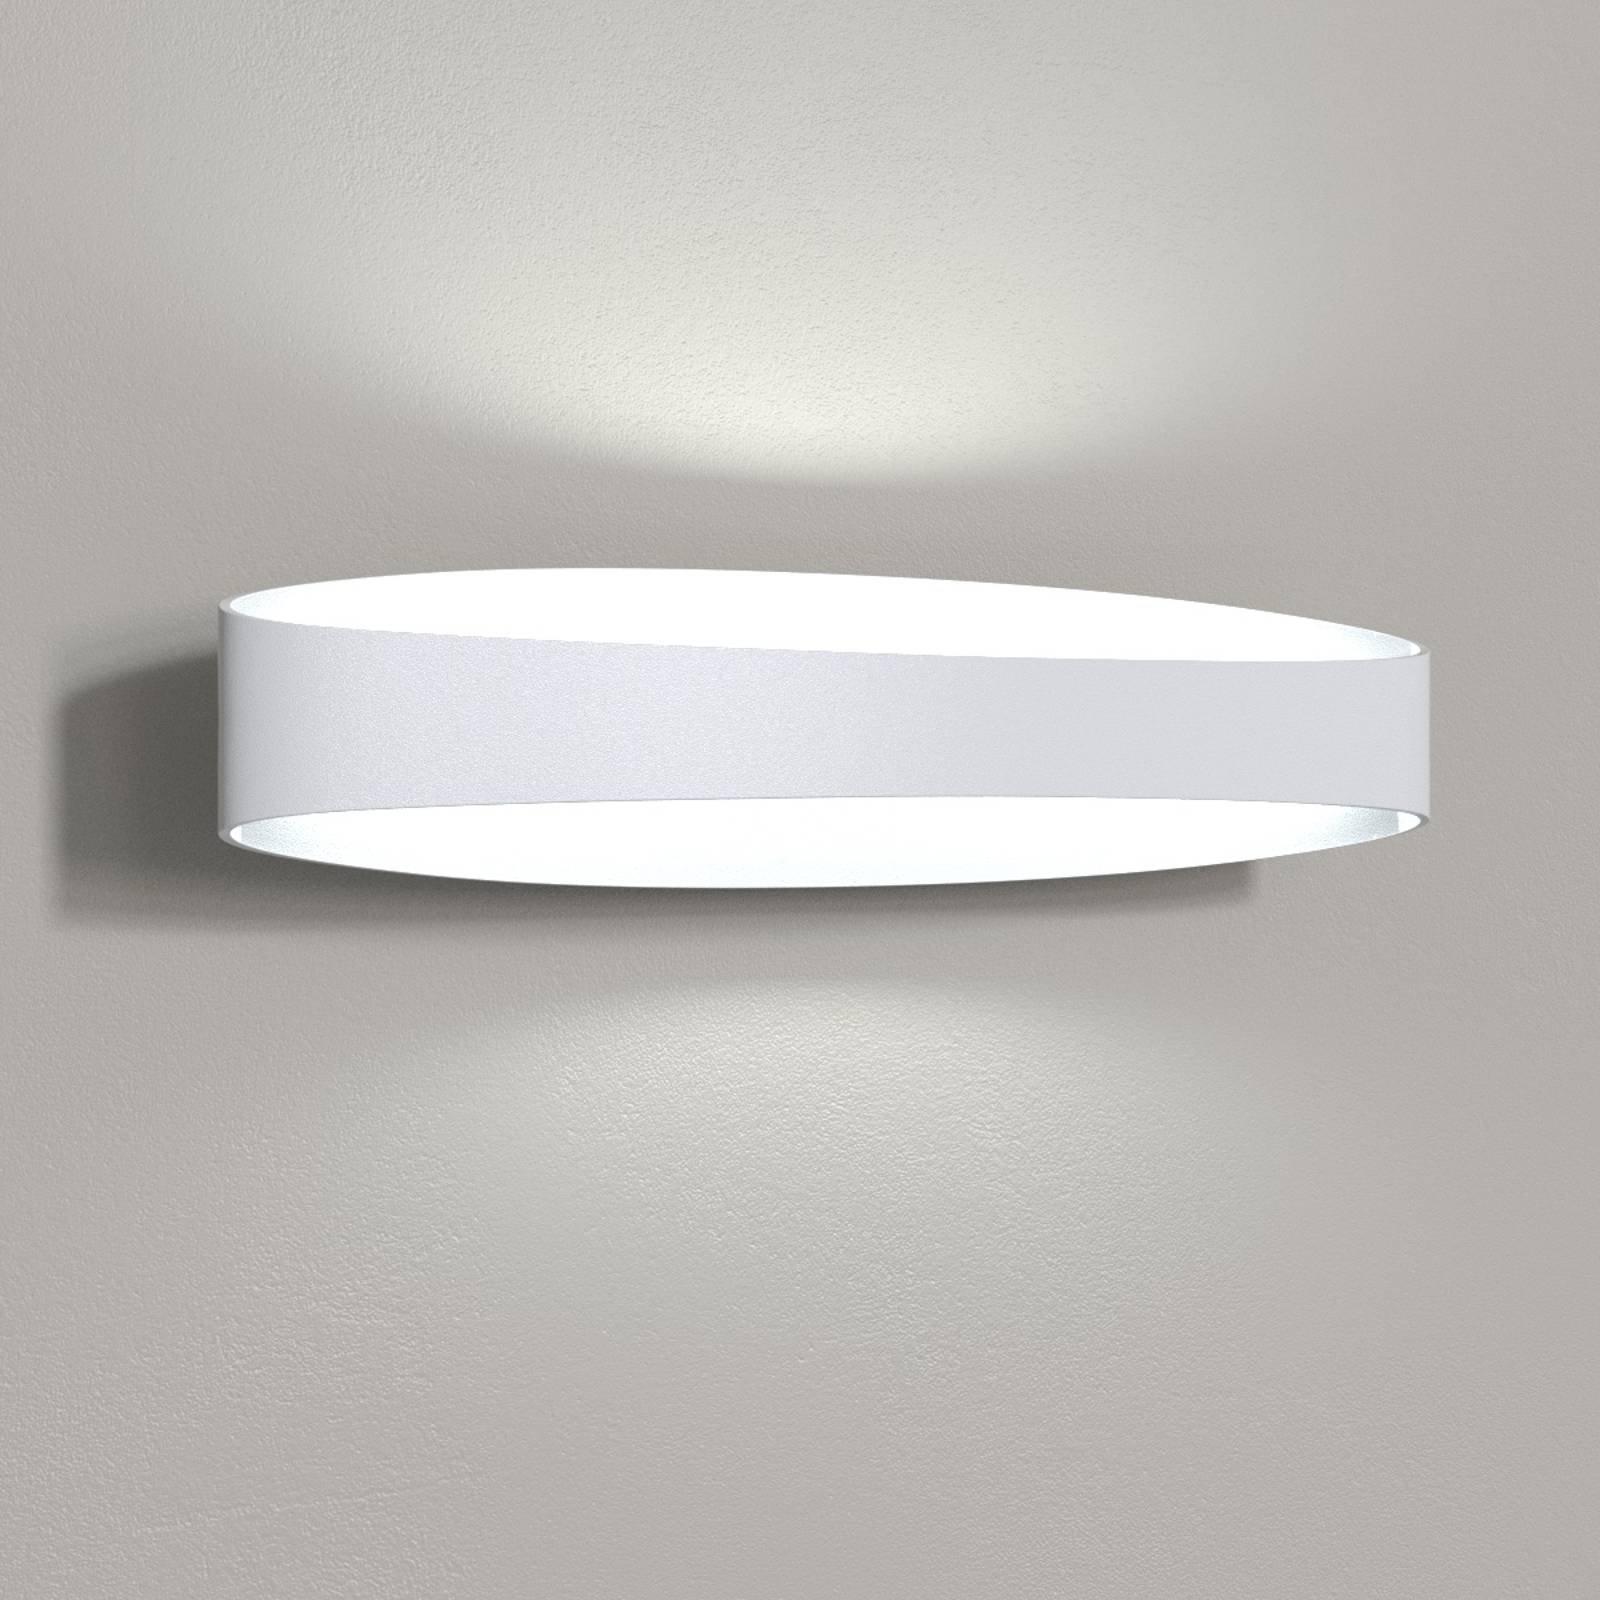 Bridge – LED-vegglampe i trykkstøpt aluminium